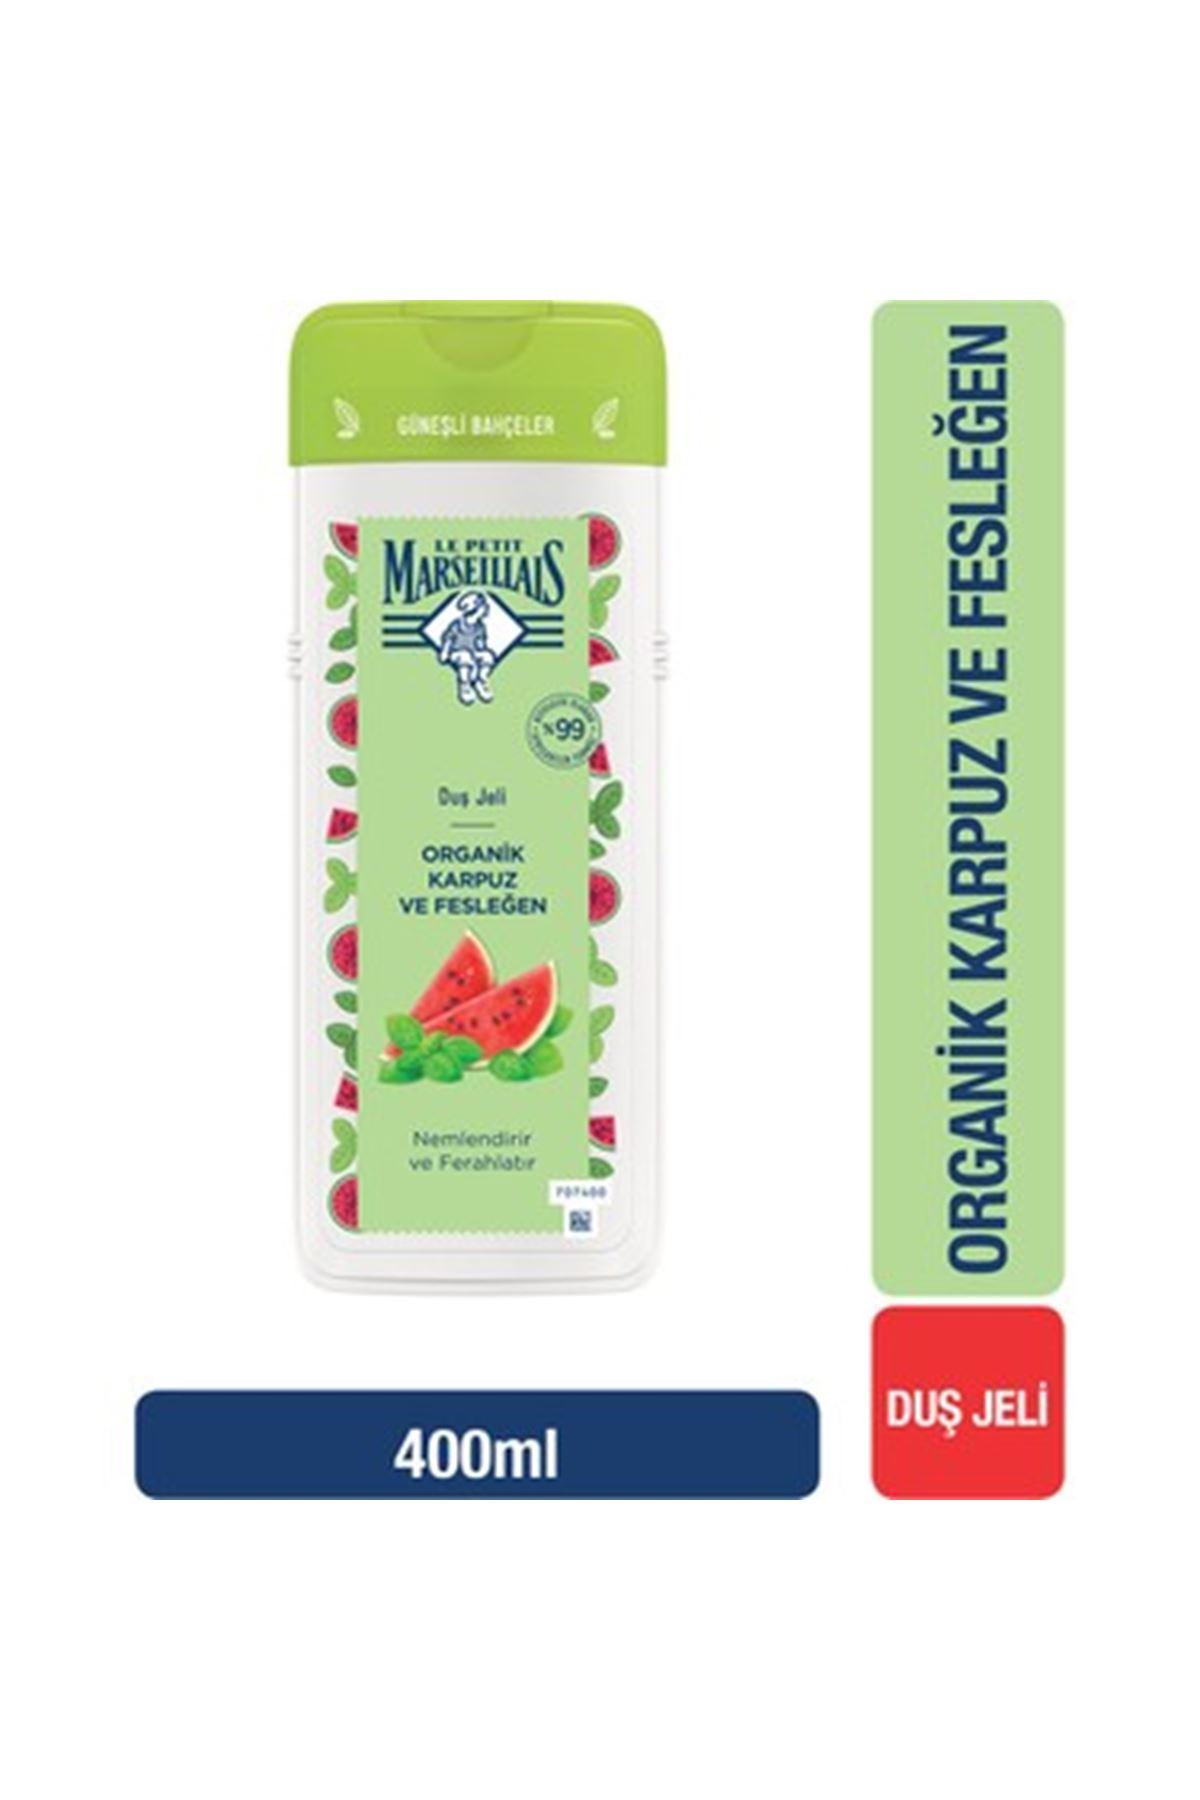 Le Petit Marseillais Organik Karpuz ve Fesleğen Duş Jeli 400 ml